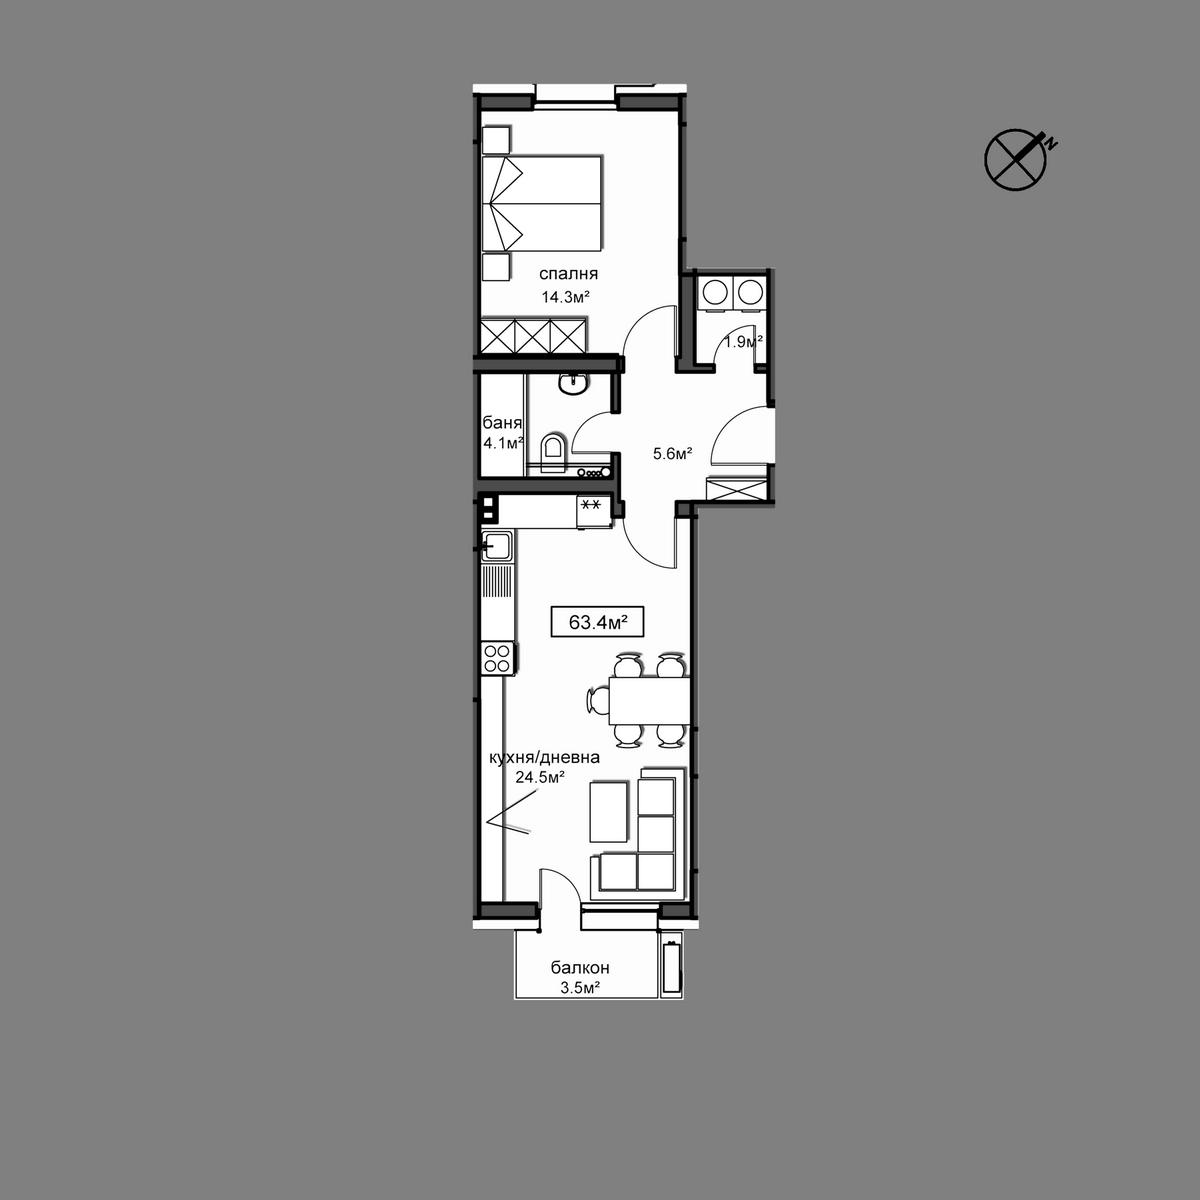 Продава апартамент ново строителство - Апартамент  Б10